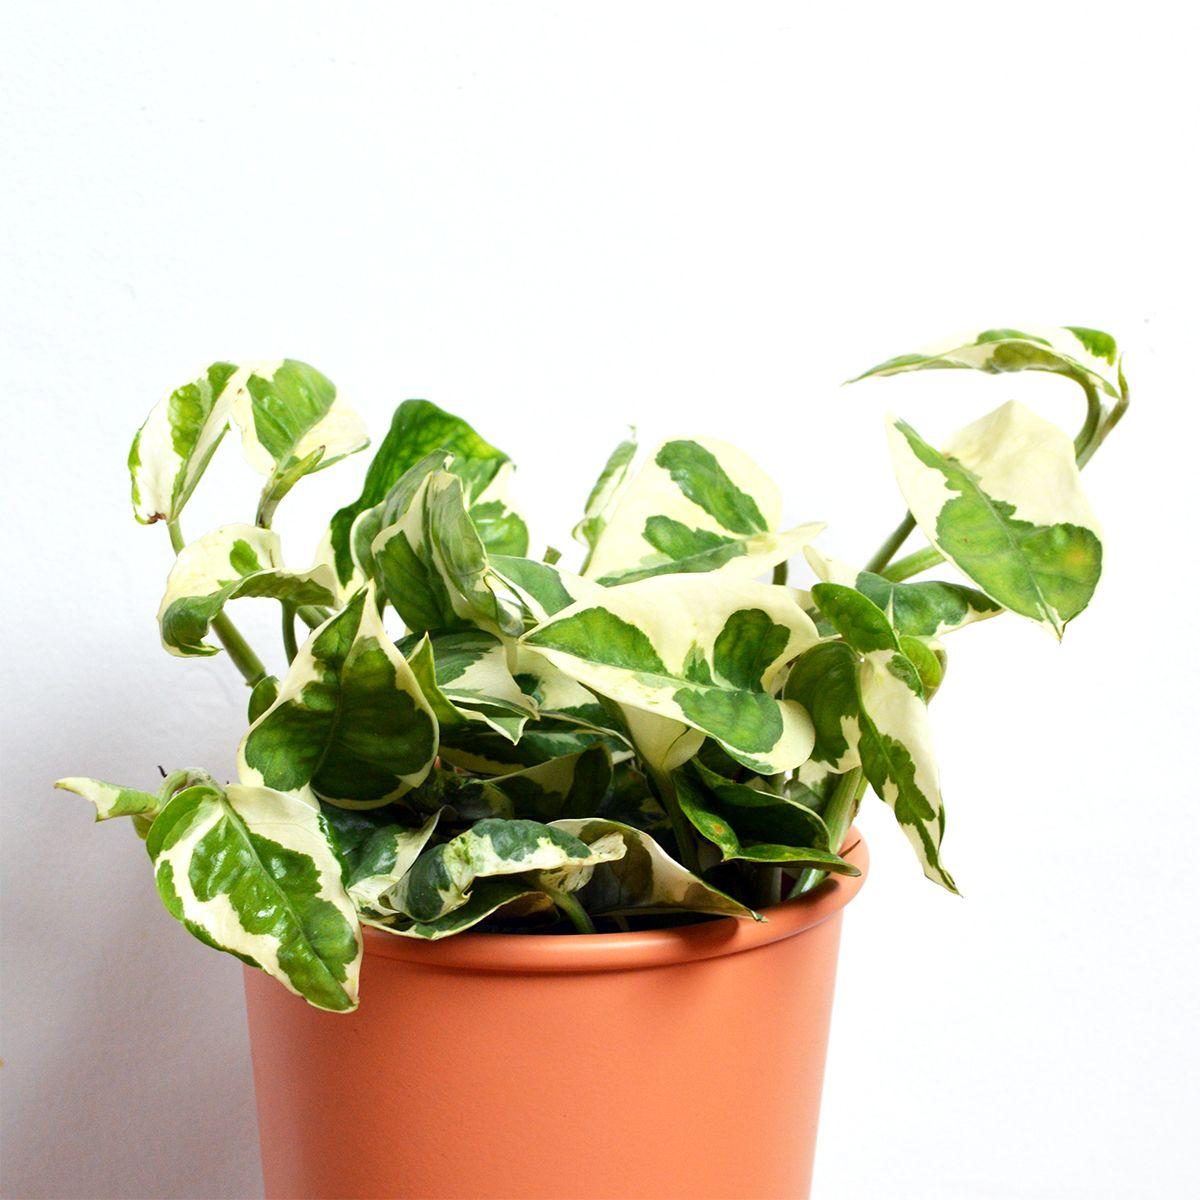 Pothos NJoy Plants, House plants, Unusual planter